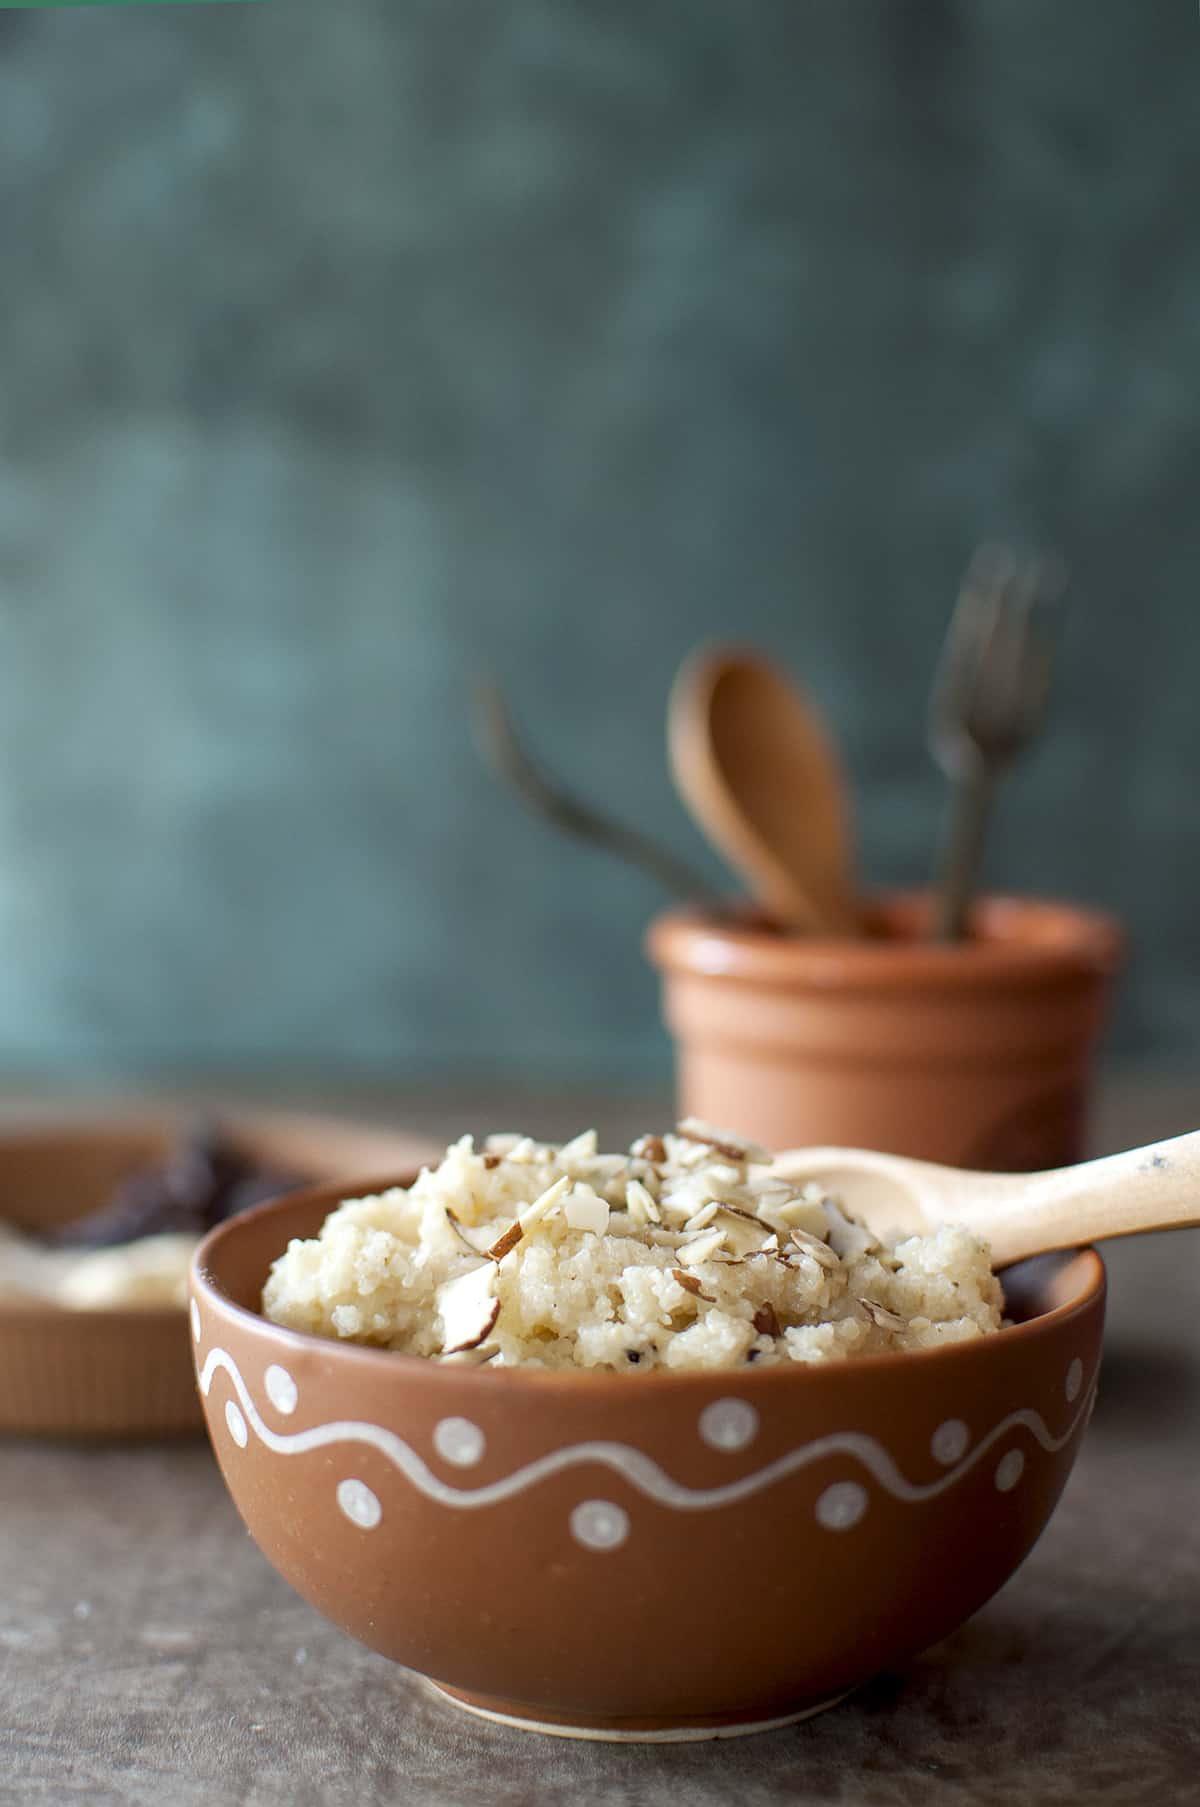 Terracotta bowl with rava kesari topped with almond flakes